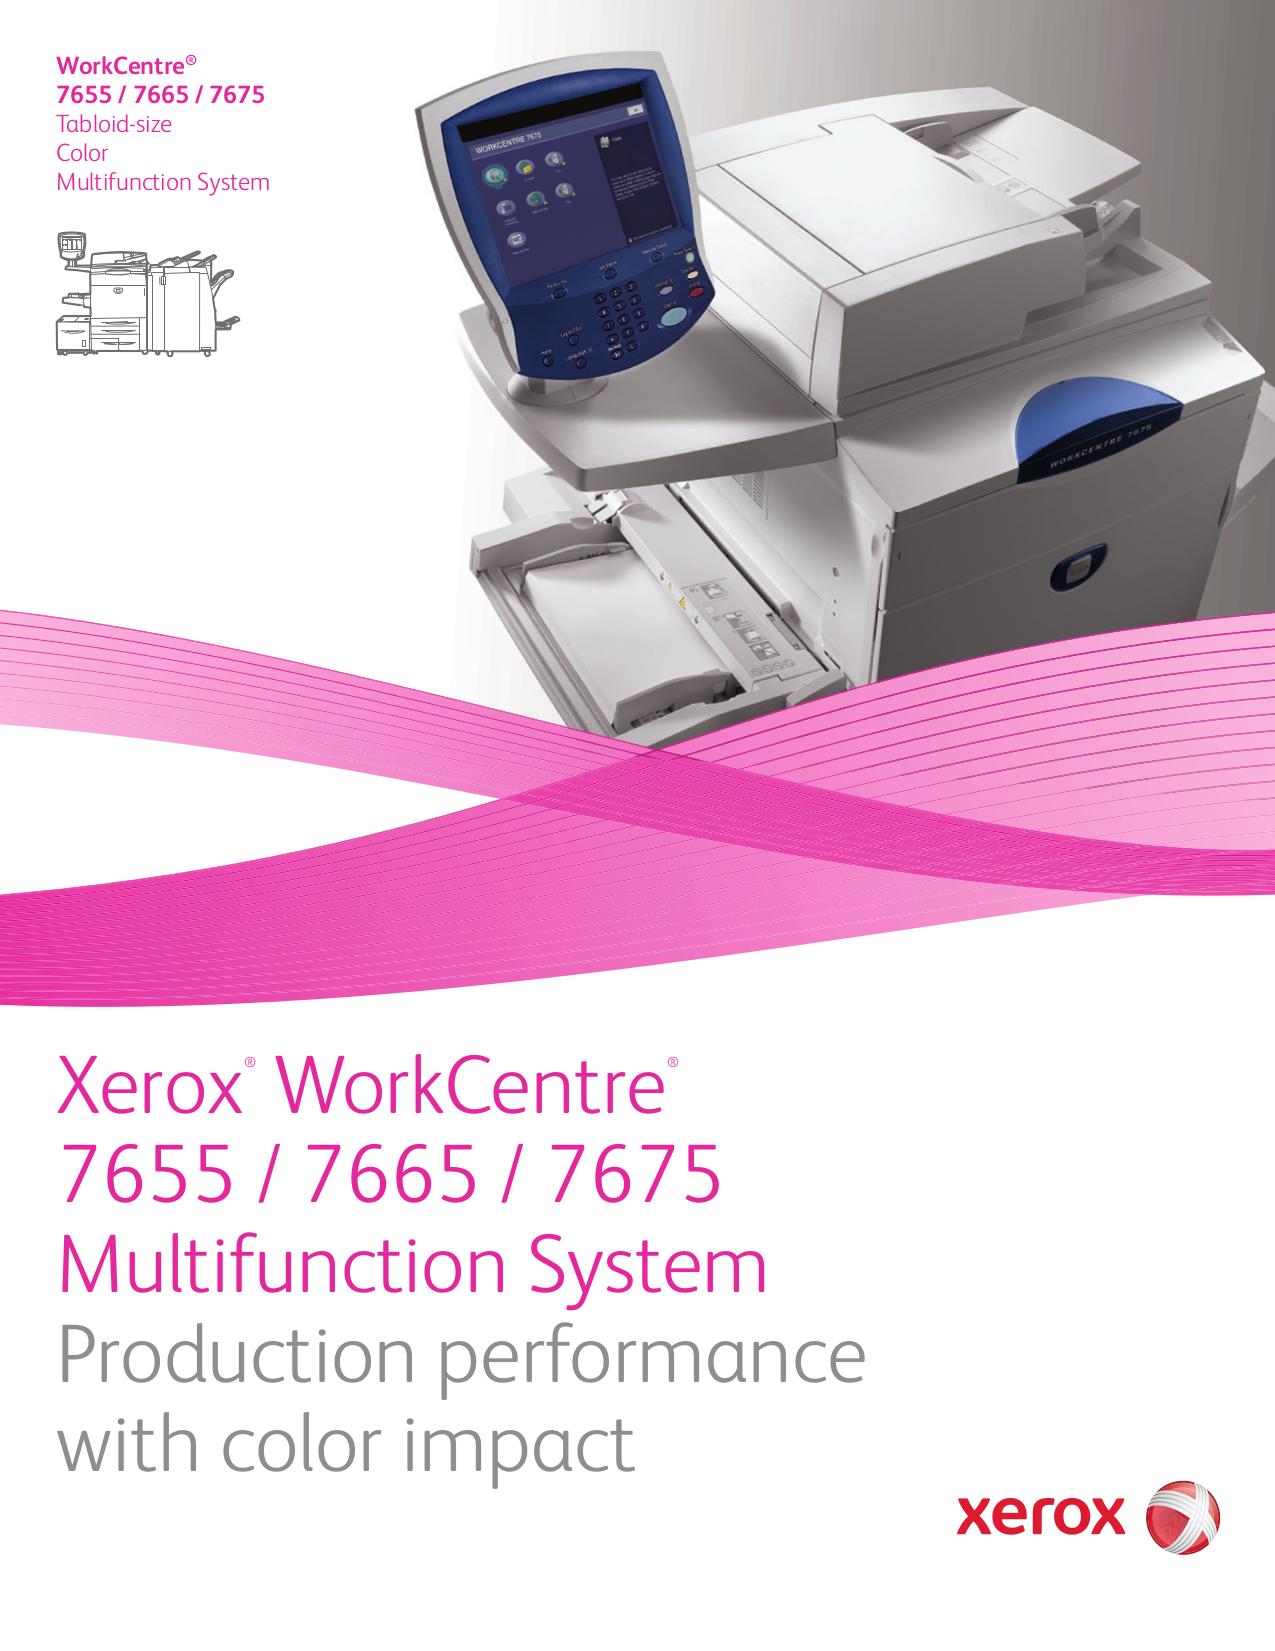 download free pdf for xerox workcentre 7675 multifunction printer manual rh umlib com Xerox WorkCentre 4250 Xerox WorkCentre 7655